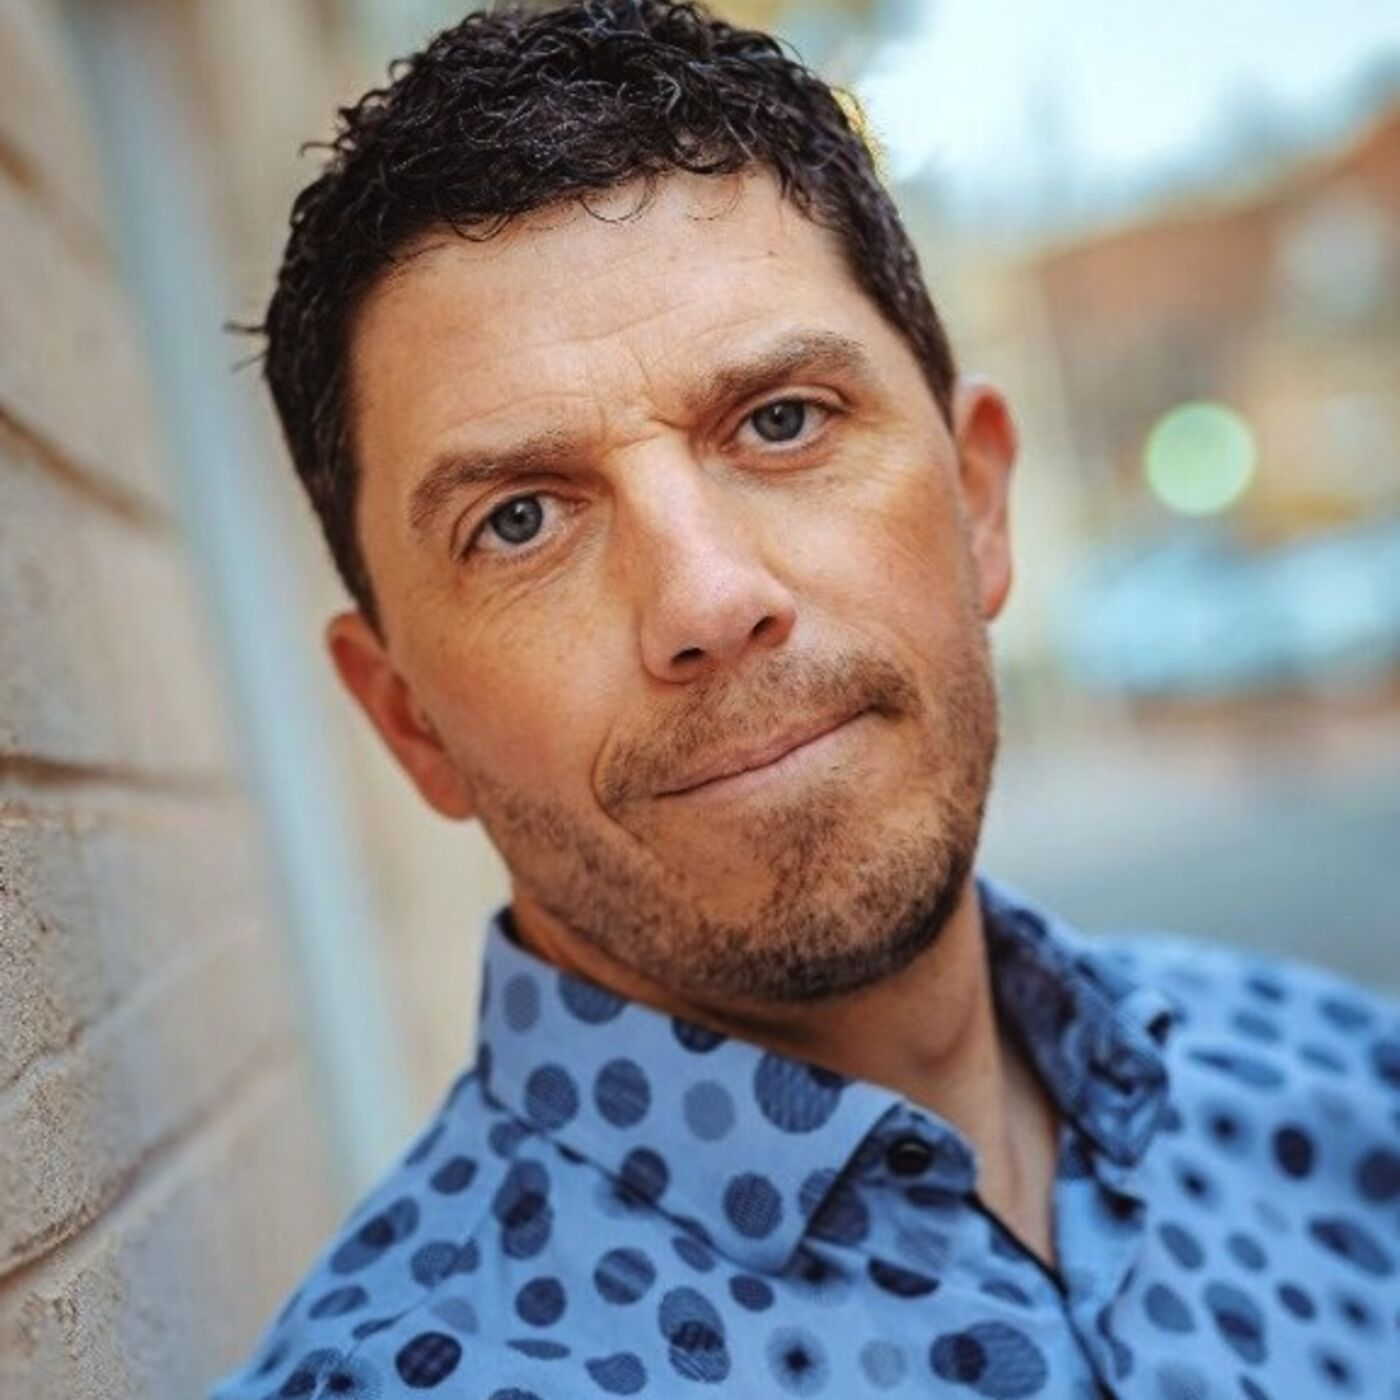 2.16 Cory Reese.  #Stronger than the Dark.  Ultramarathoner, Author, Social Worker.